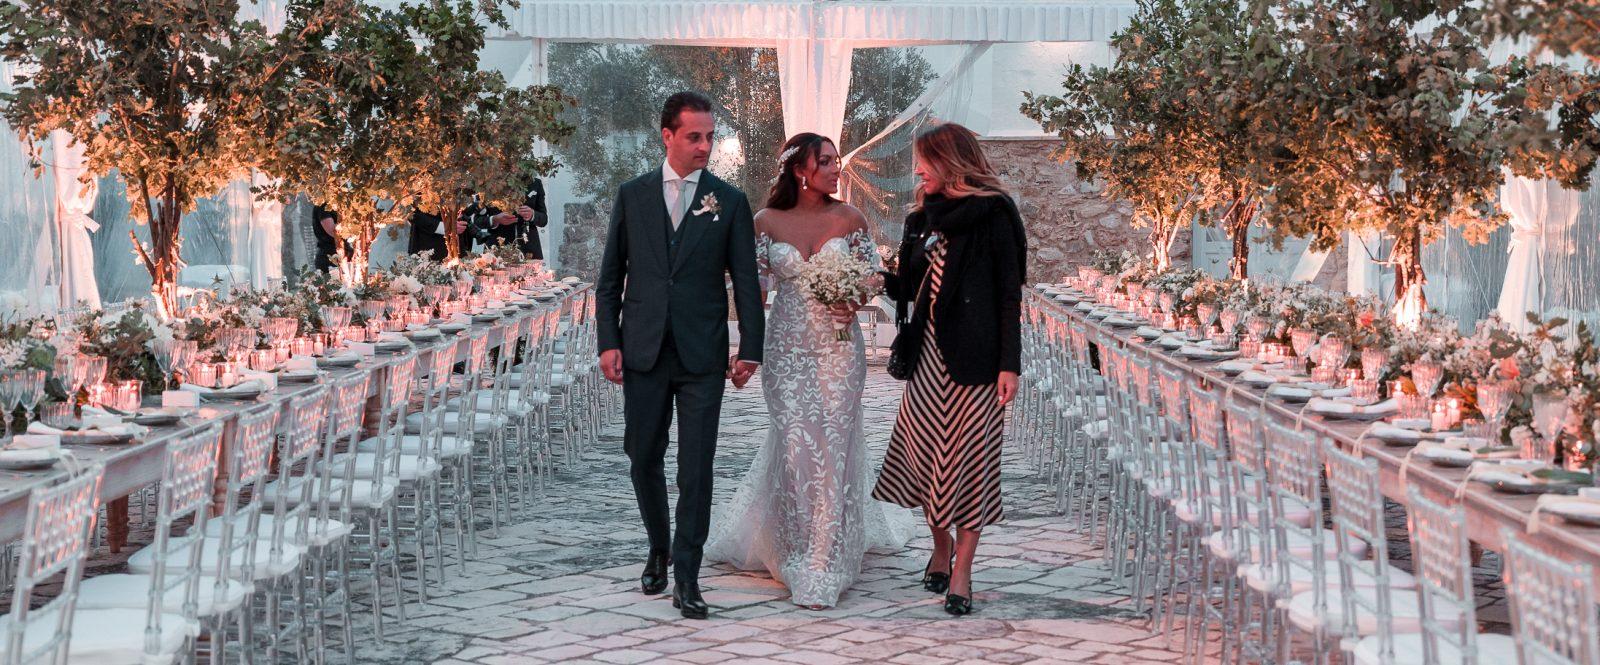 Silvia Bettini wedding planner